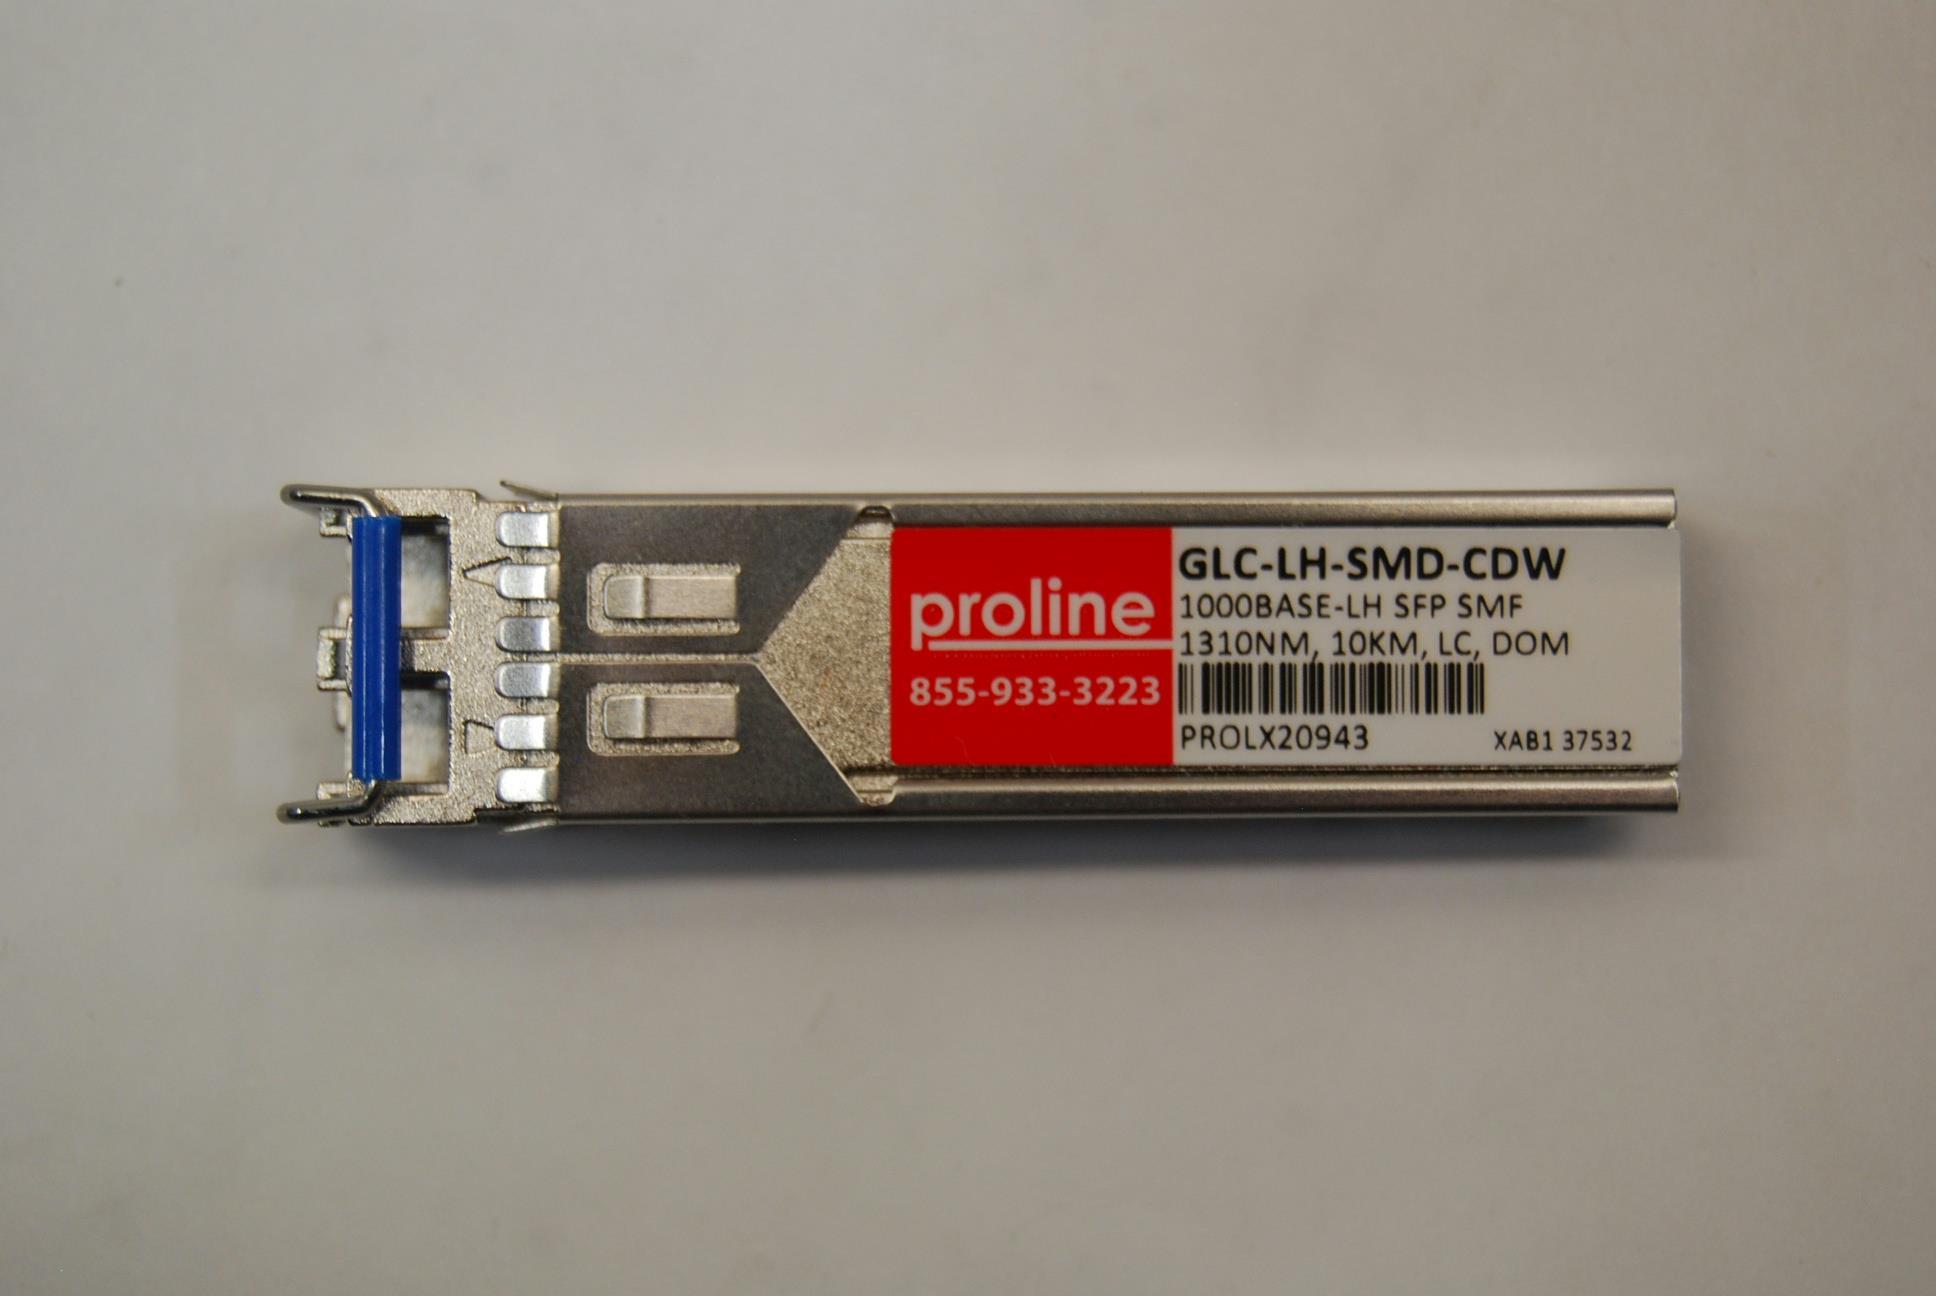 PROLINE GLC-LH-SMD-CDW 1000BASE-LX//LH SFP Transceiver Module 1310NM 800130096